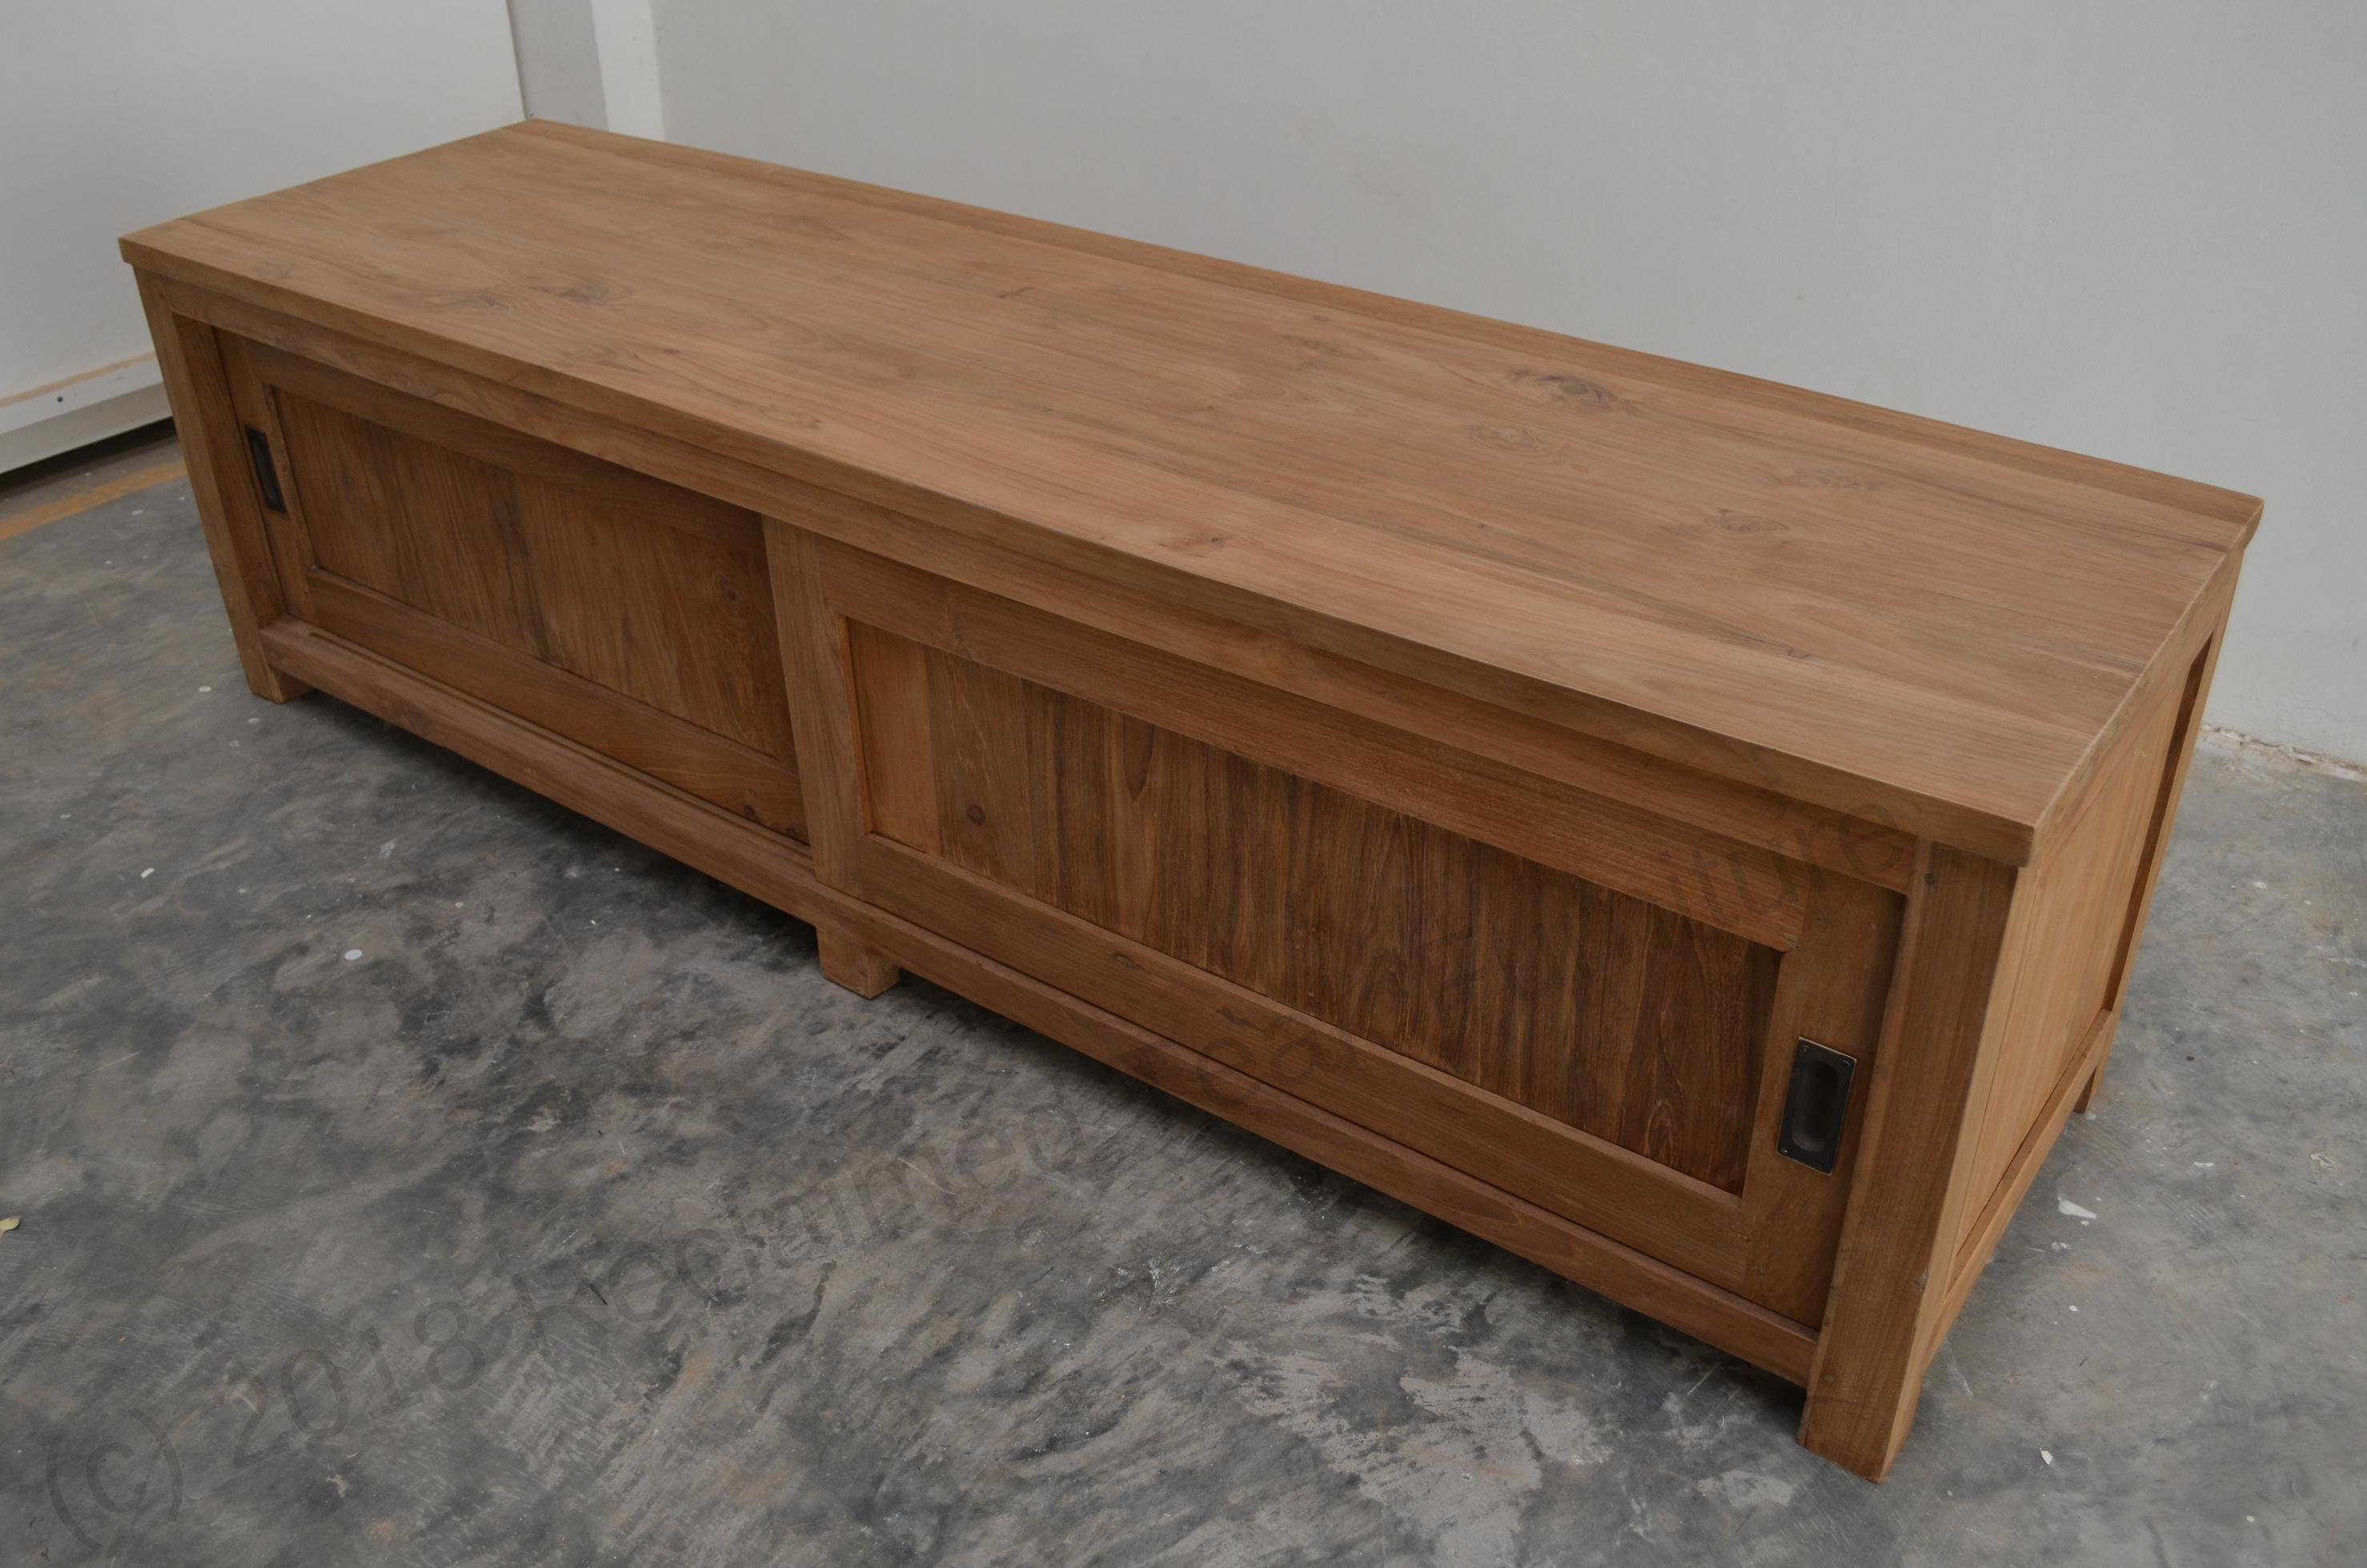 teak tv unit 180 x 50 x 50 cm reclaimed teak furniture. Black Bedroom Furniture Sets. Home Design Ideas